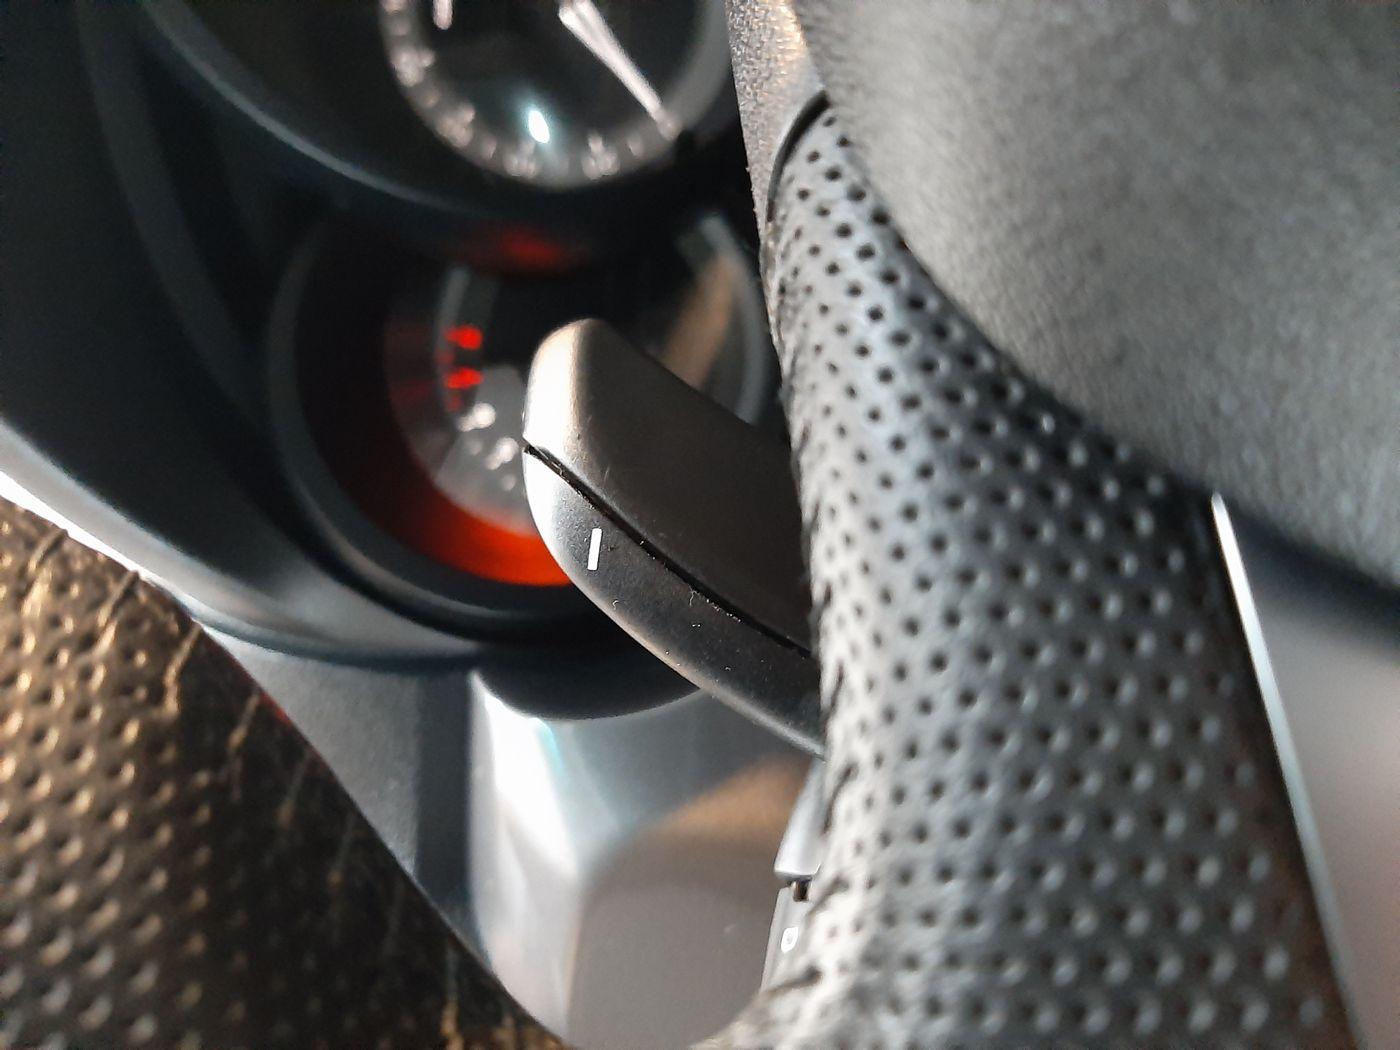 Citroën AIRCROSS Shine 1.6 Flex 16V 5p Aut.